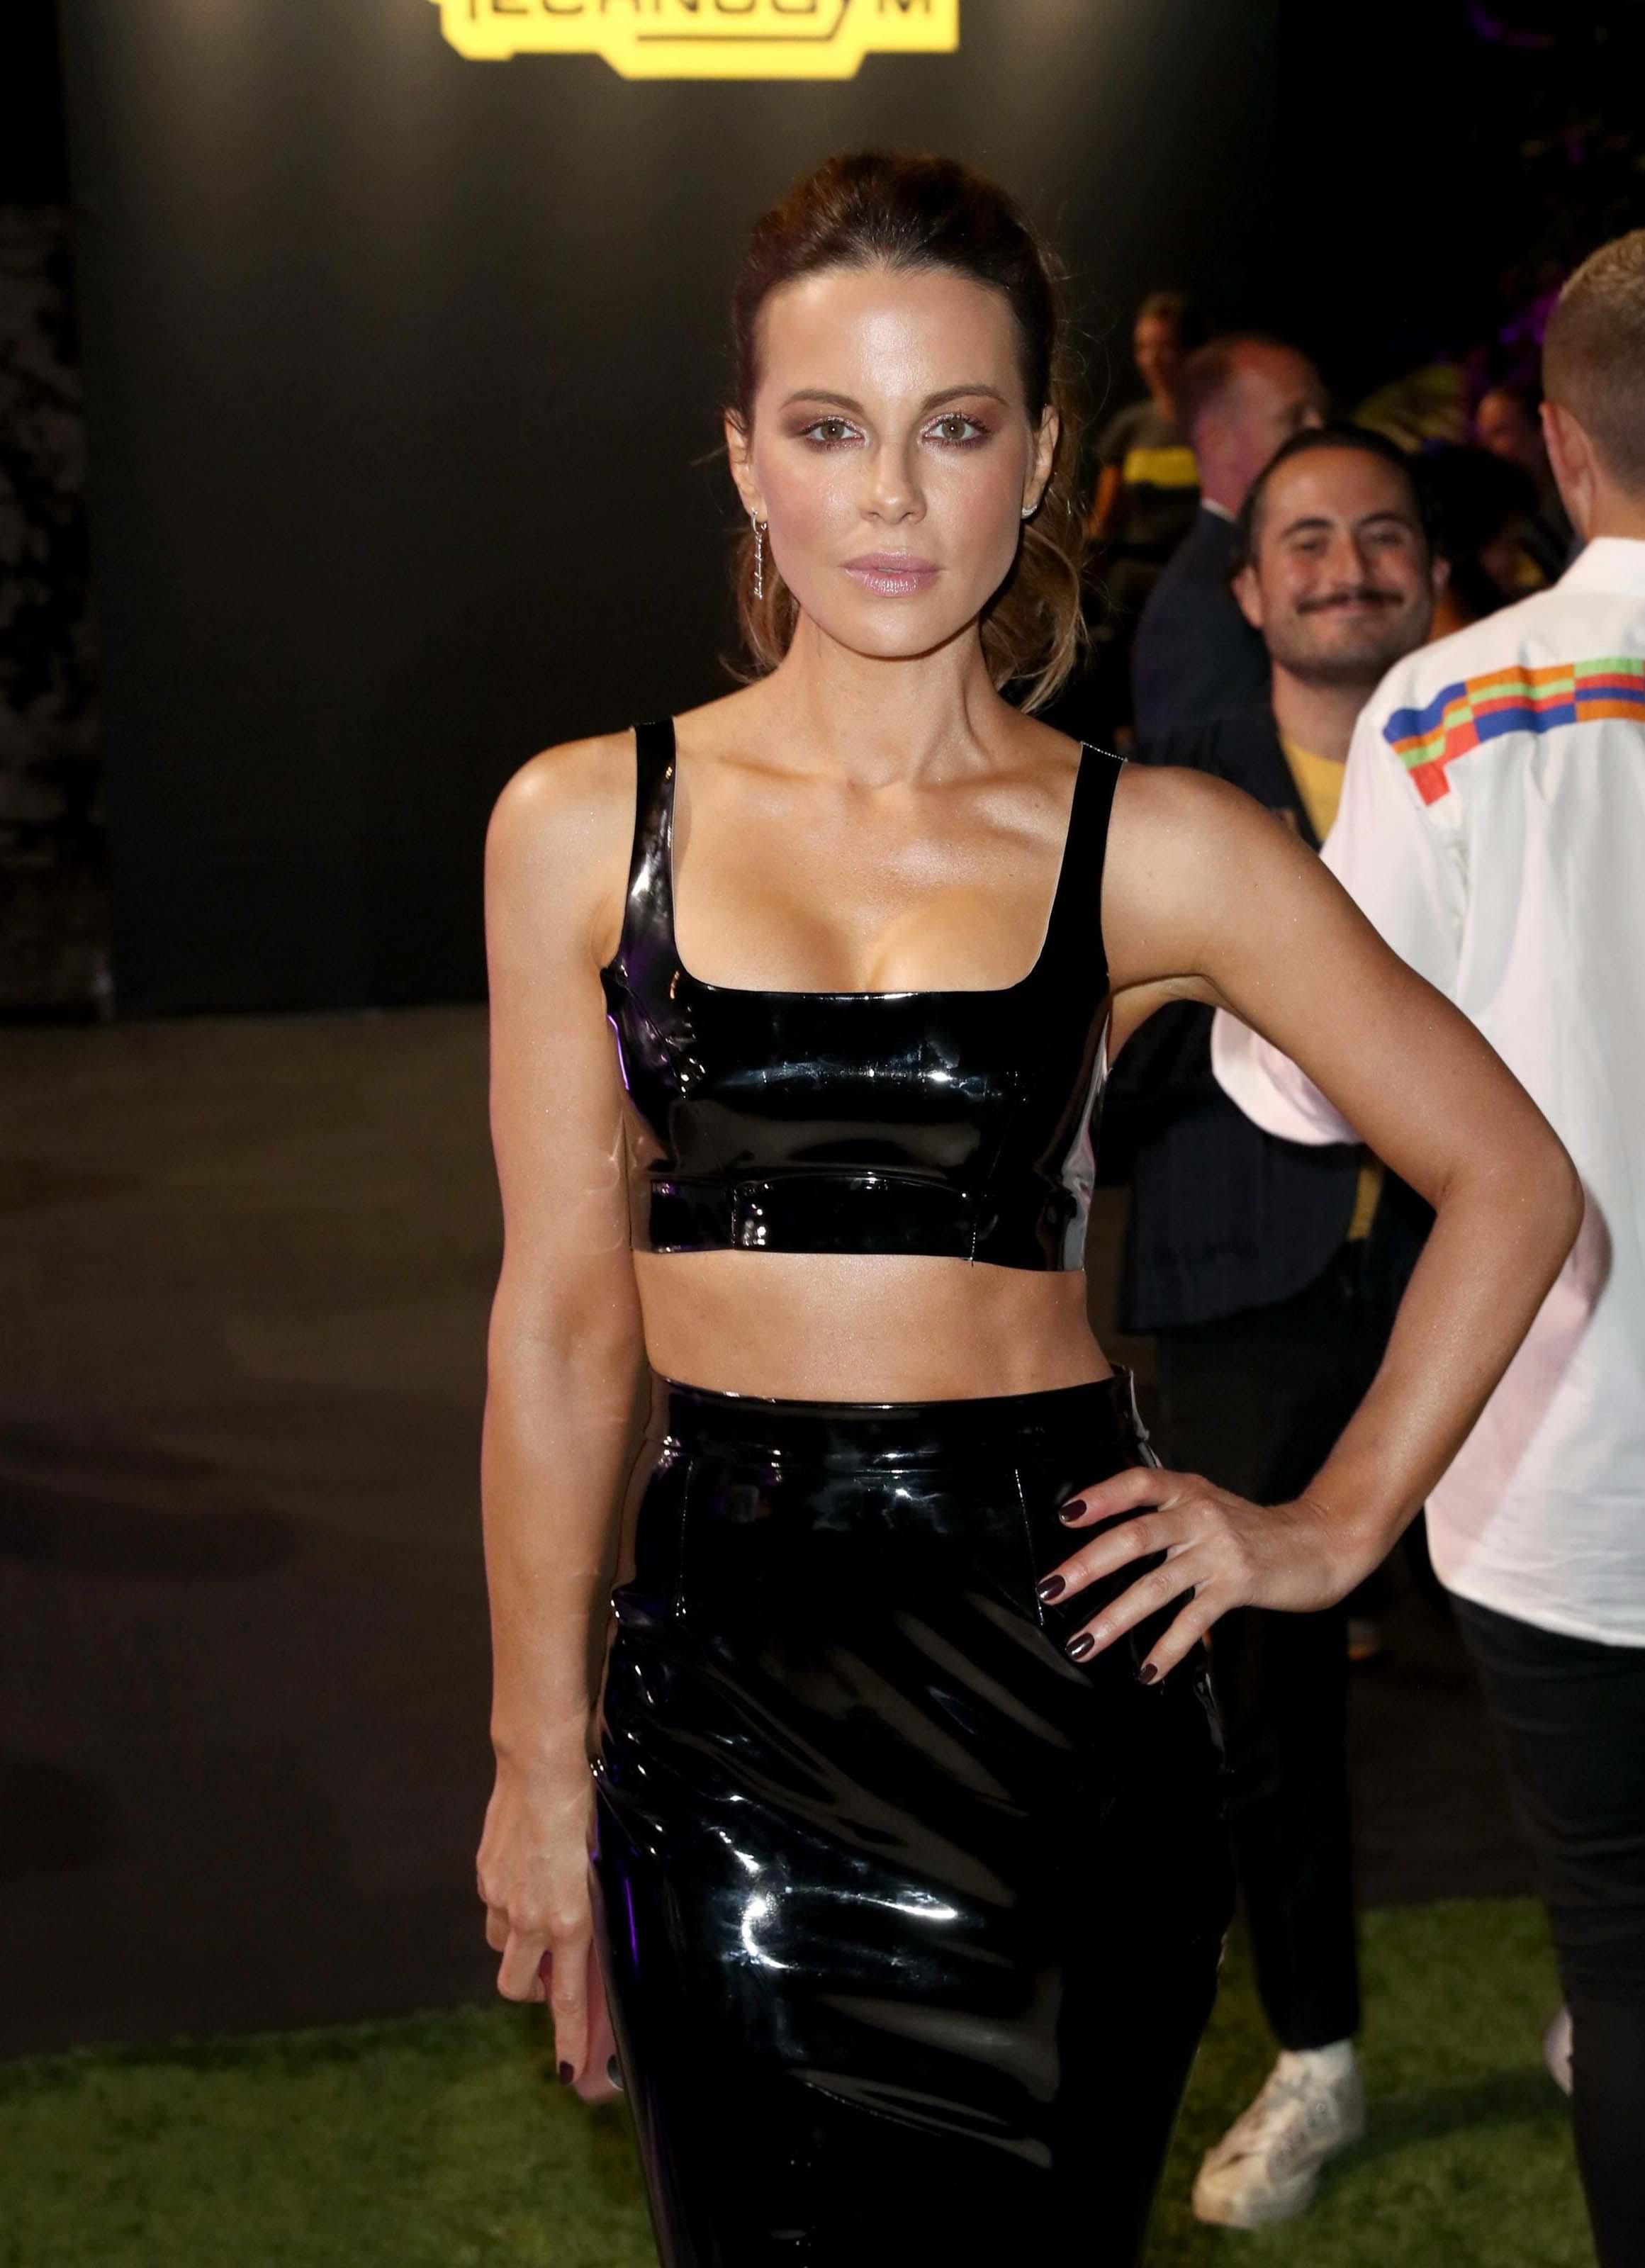 Kate Beckinsale attends Rolls Royce X Technogym Party